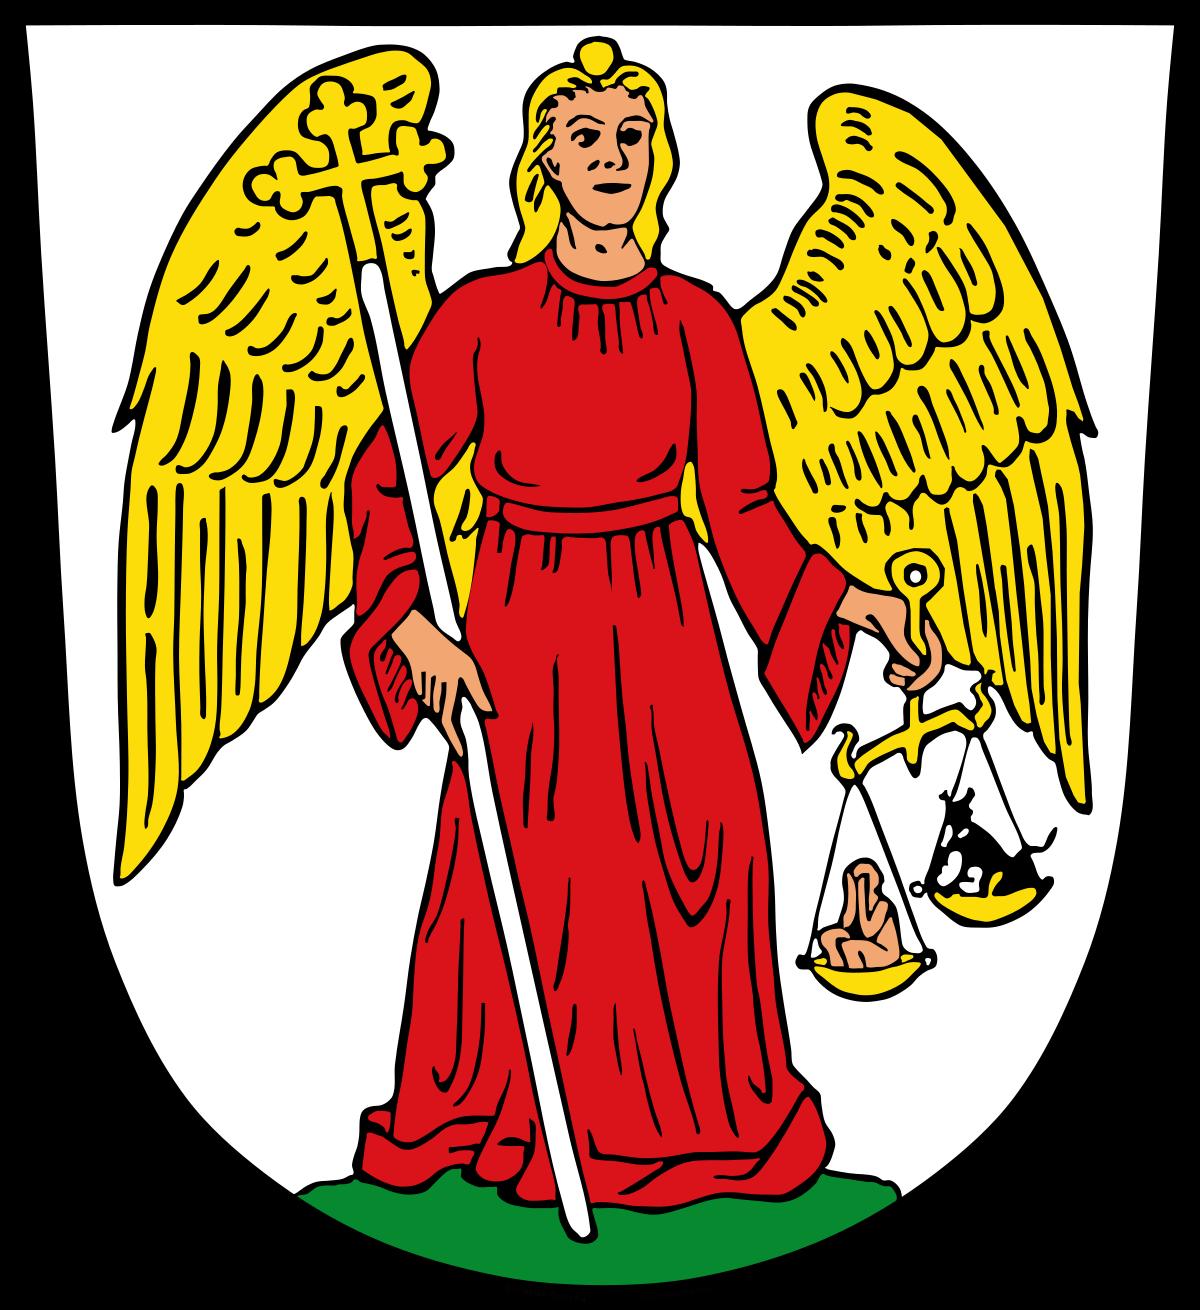 Liste der Baudenkmäler in Ludwigsstadt.